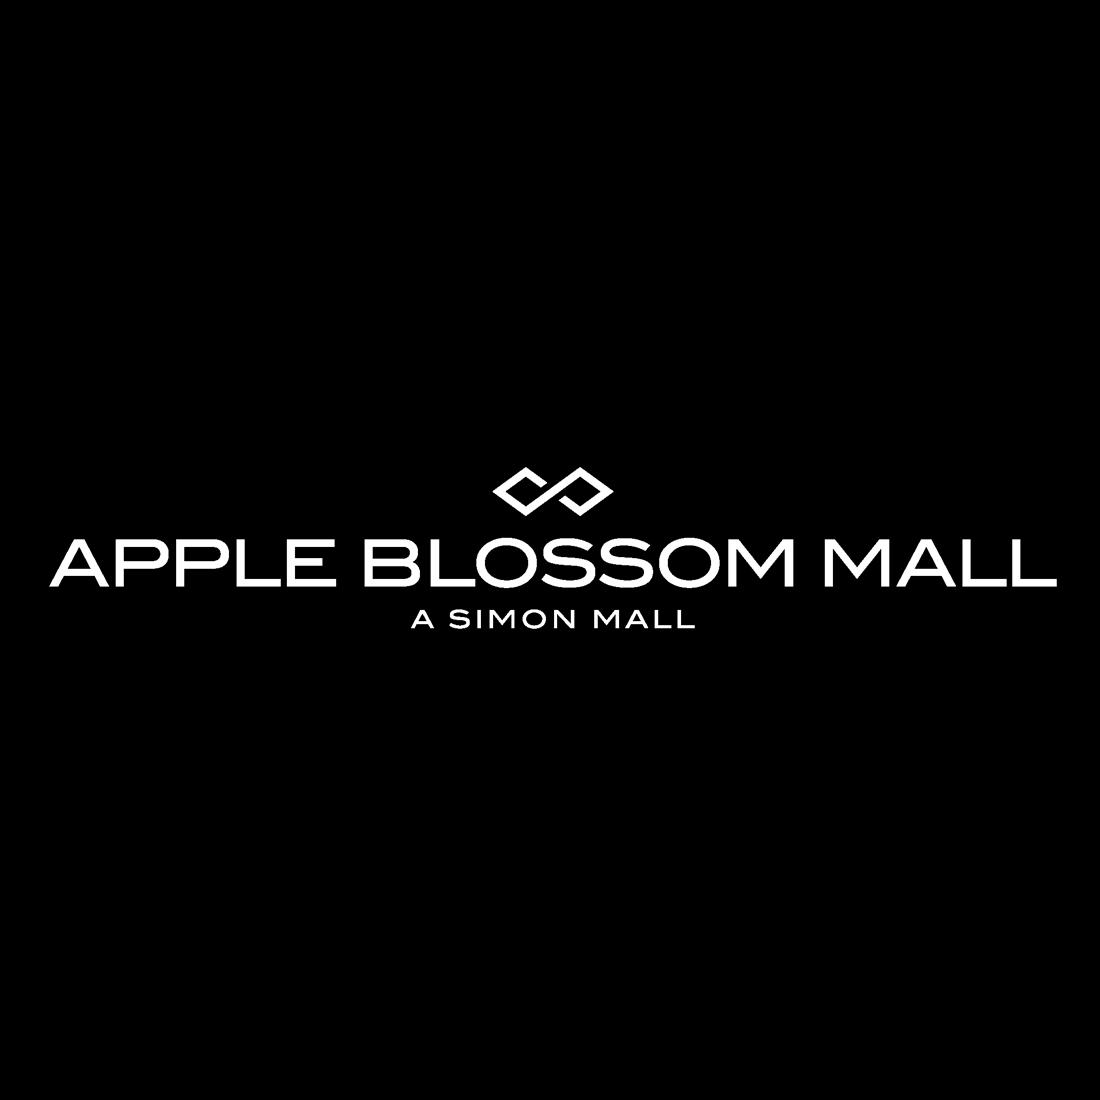 Apple Blossom Mall